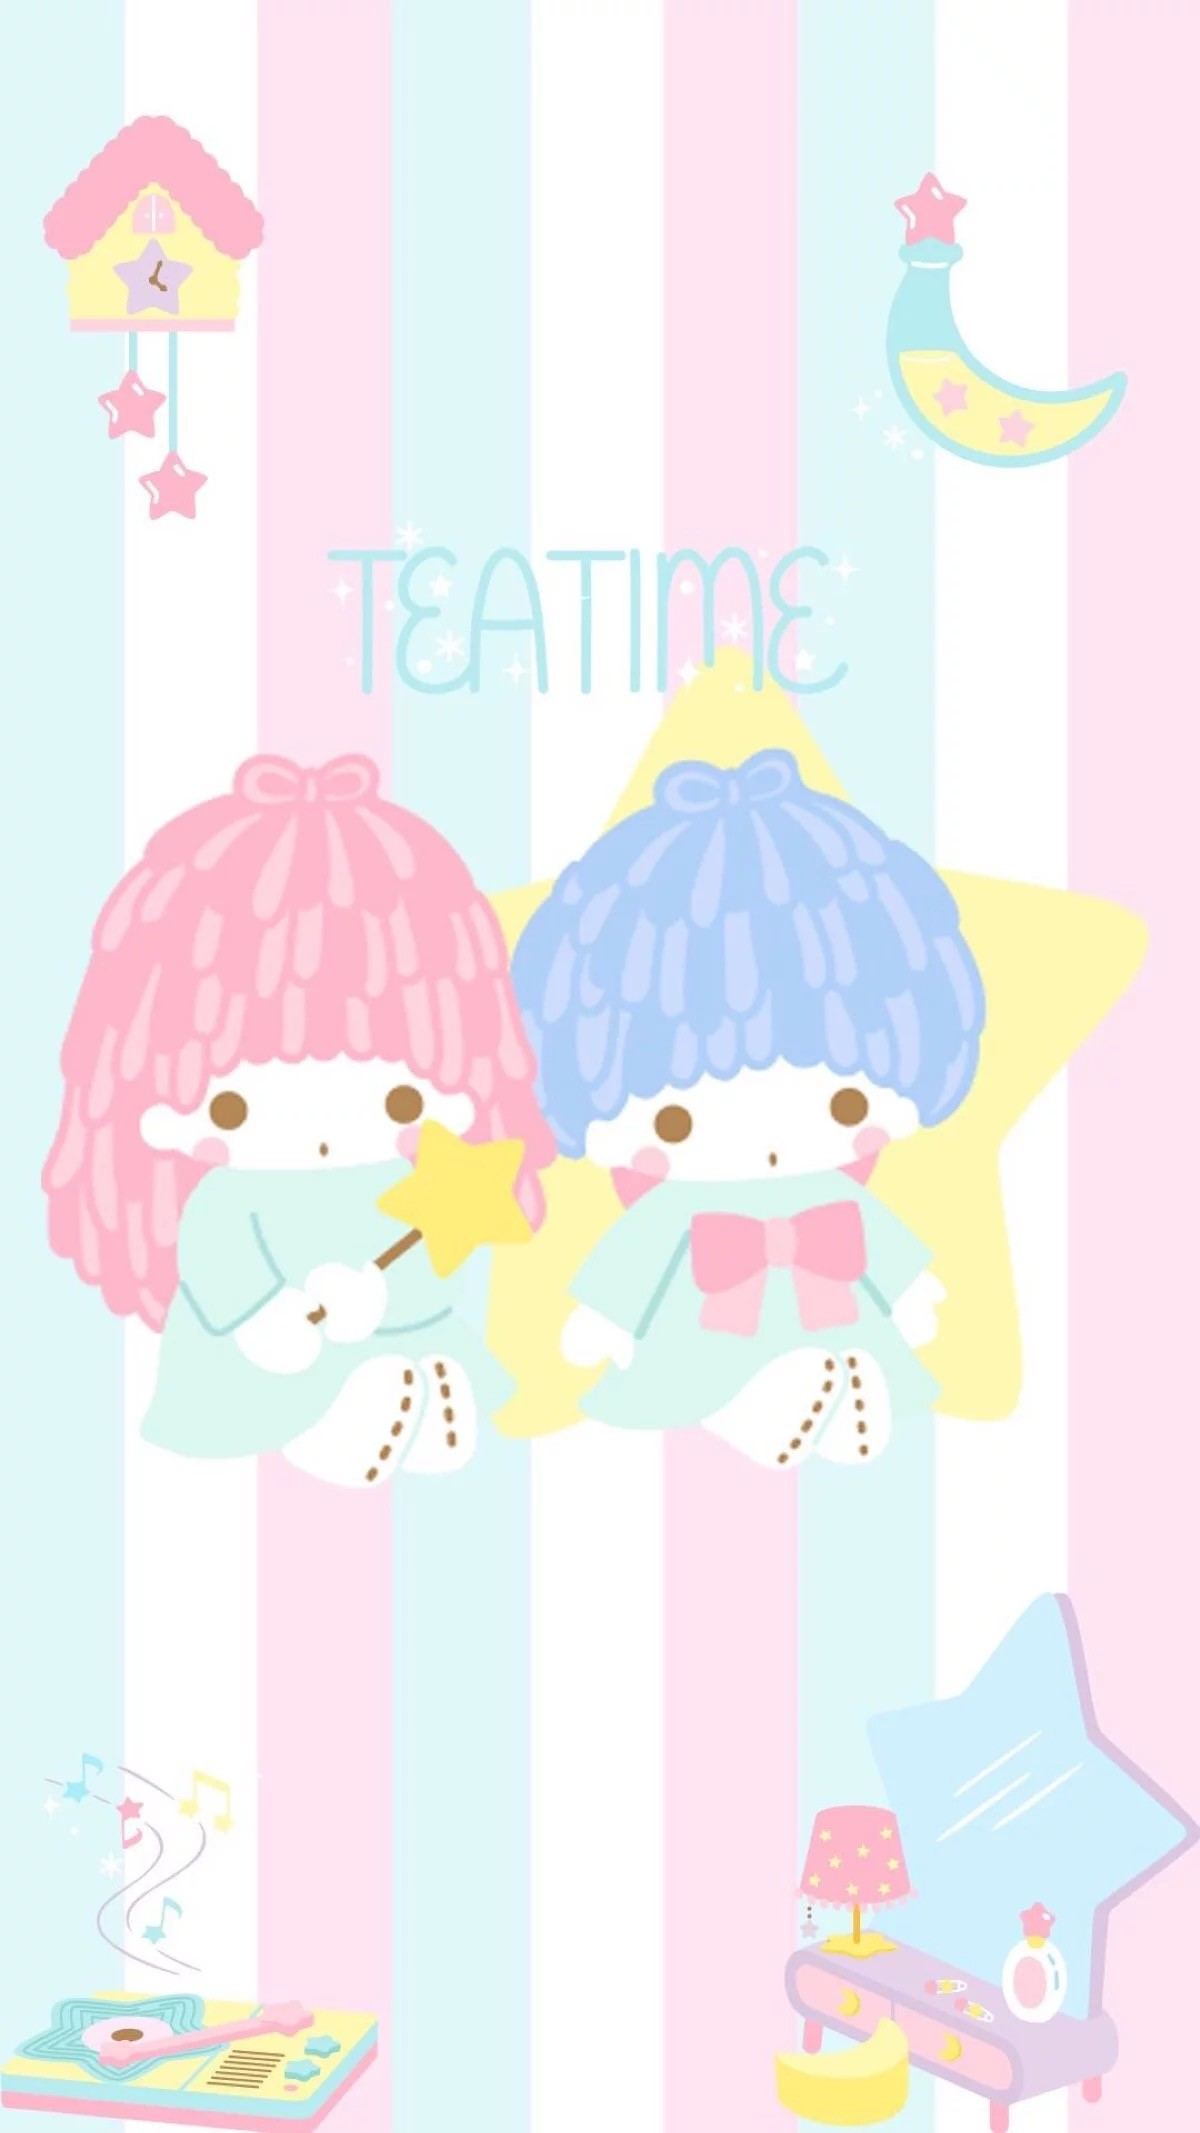 Sanrio Wallpaper, Iphone Wallpaper, Sanrio Characters, - Phone Wallpaper Little Twin Stars - HD Wallpaper